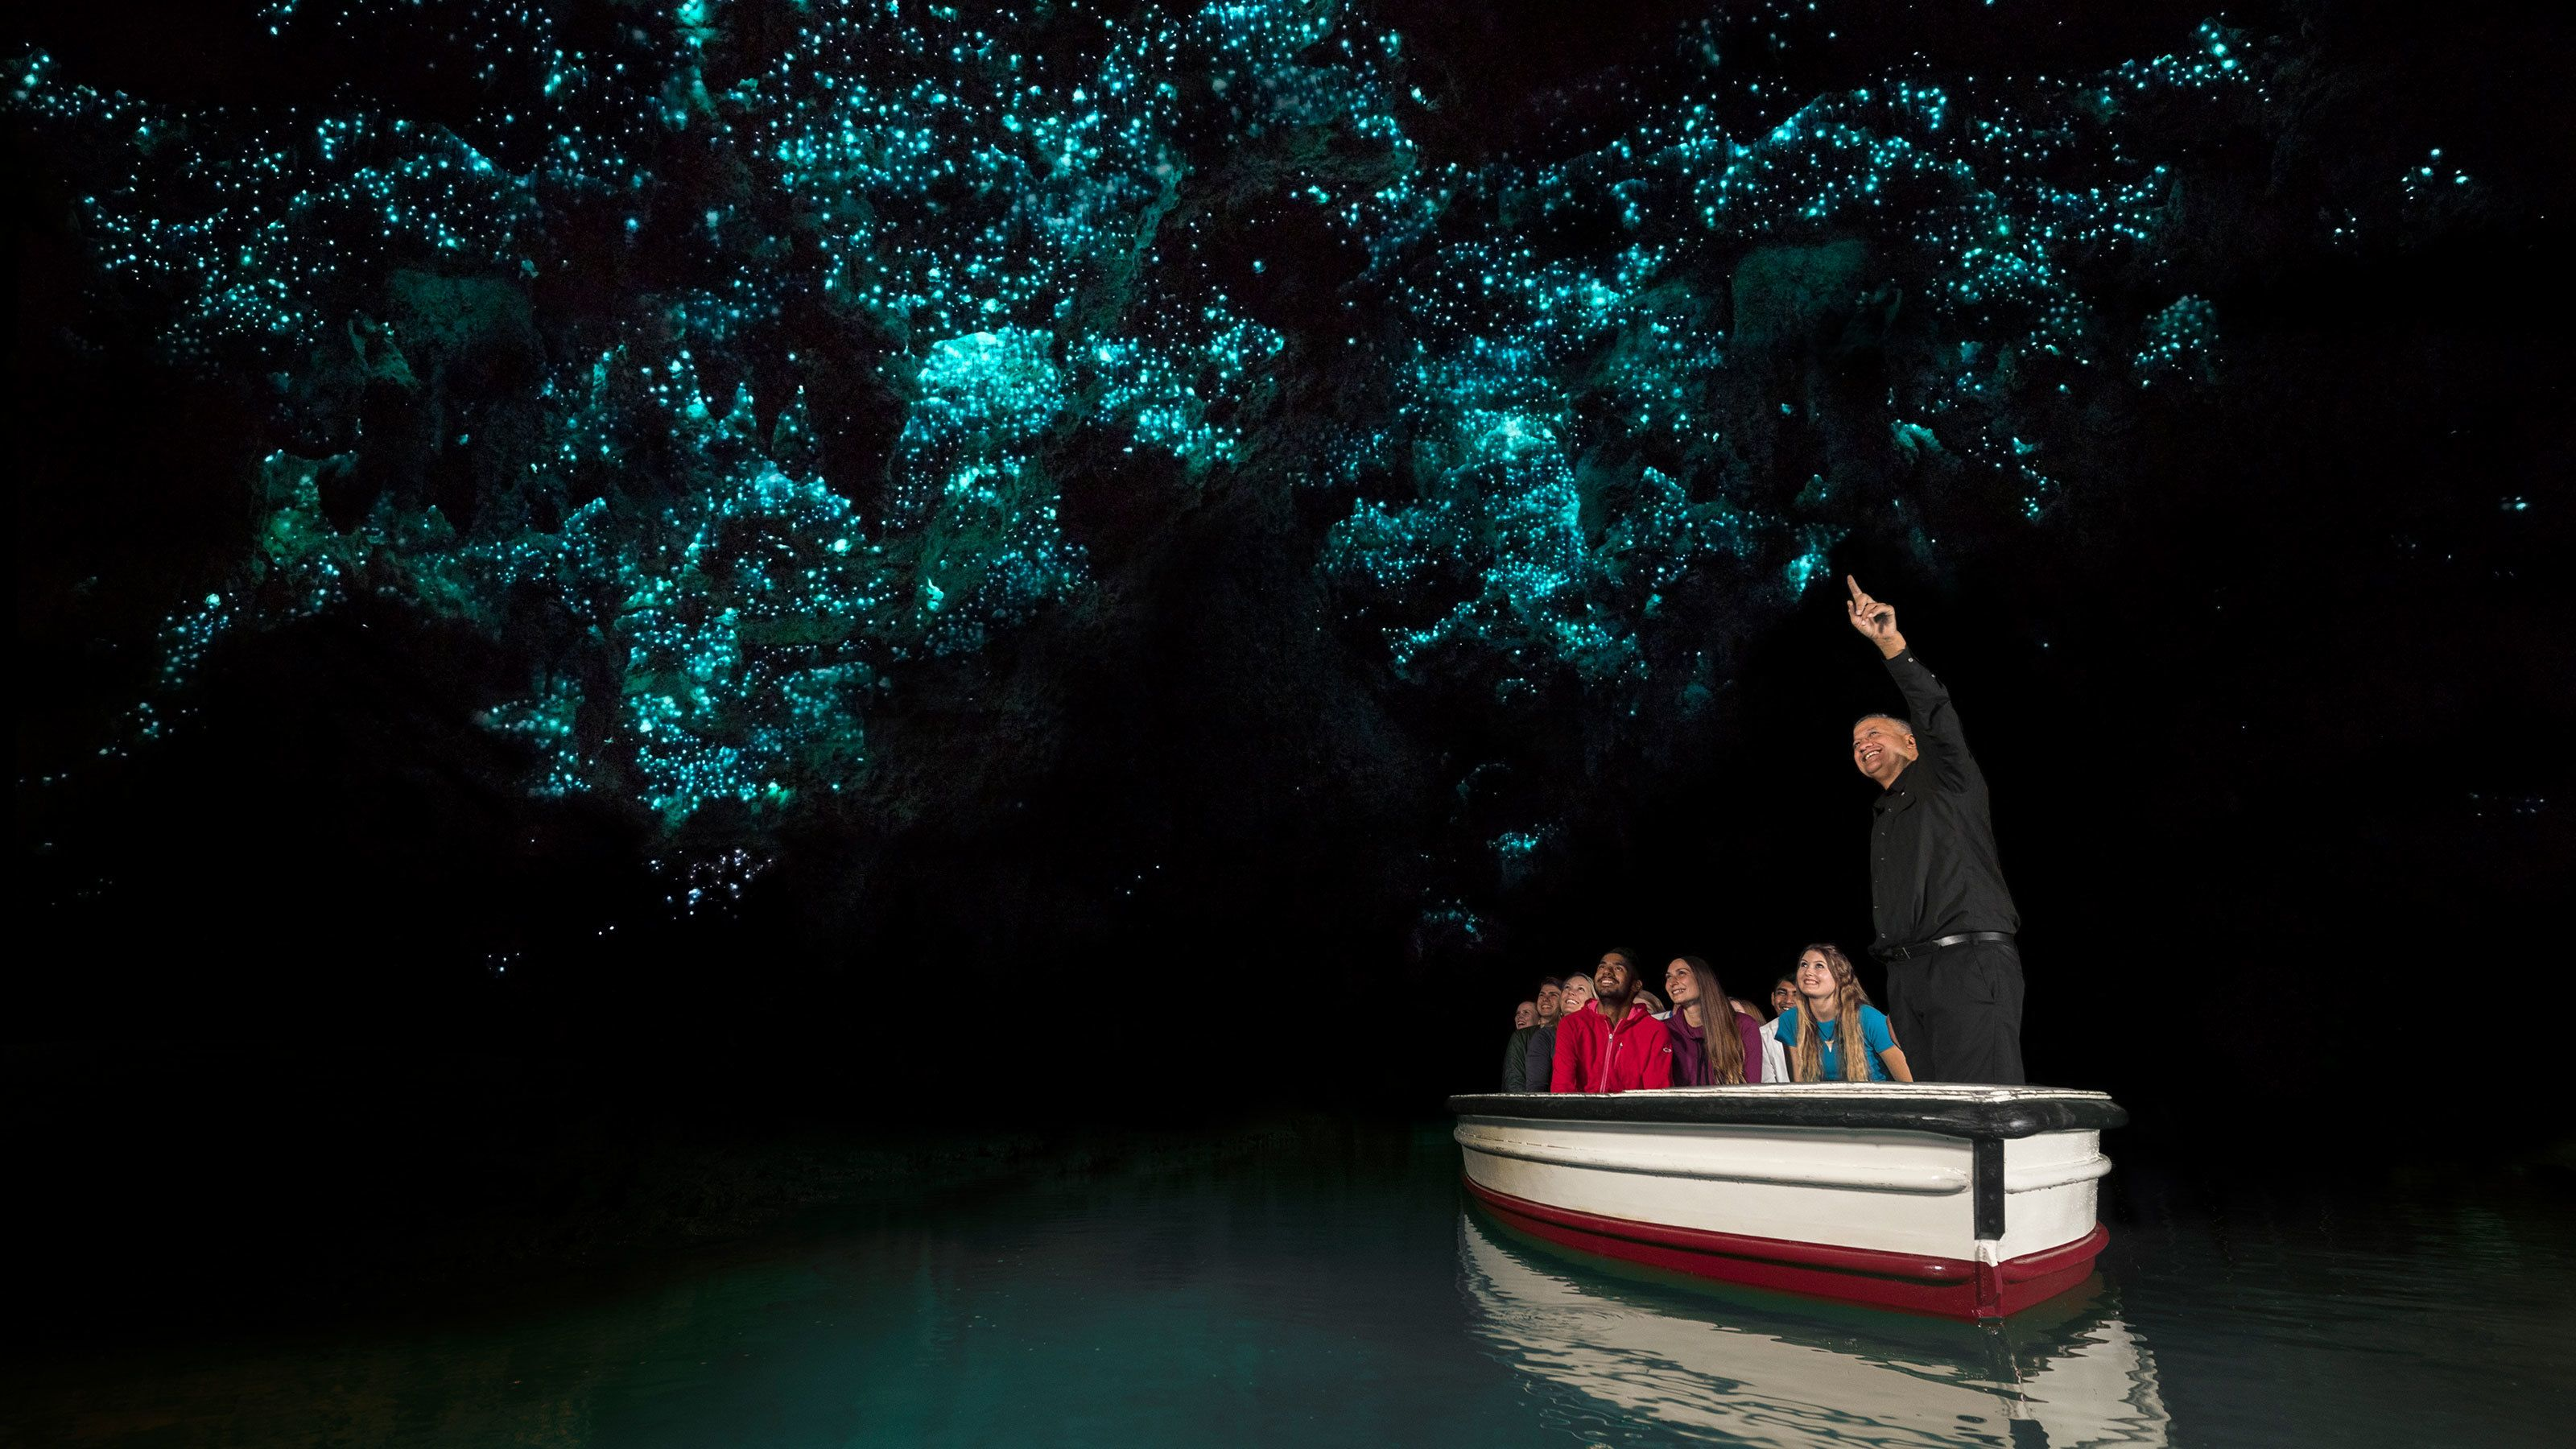 Waitomo Glowworm Caves & Rotorua Full-Day Tour